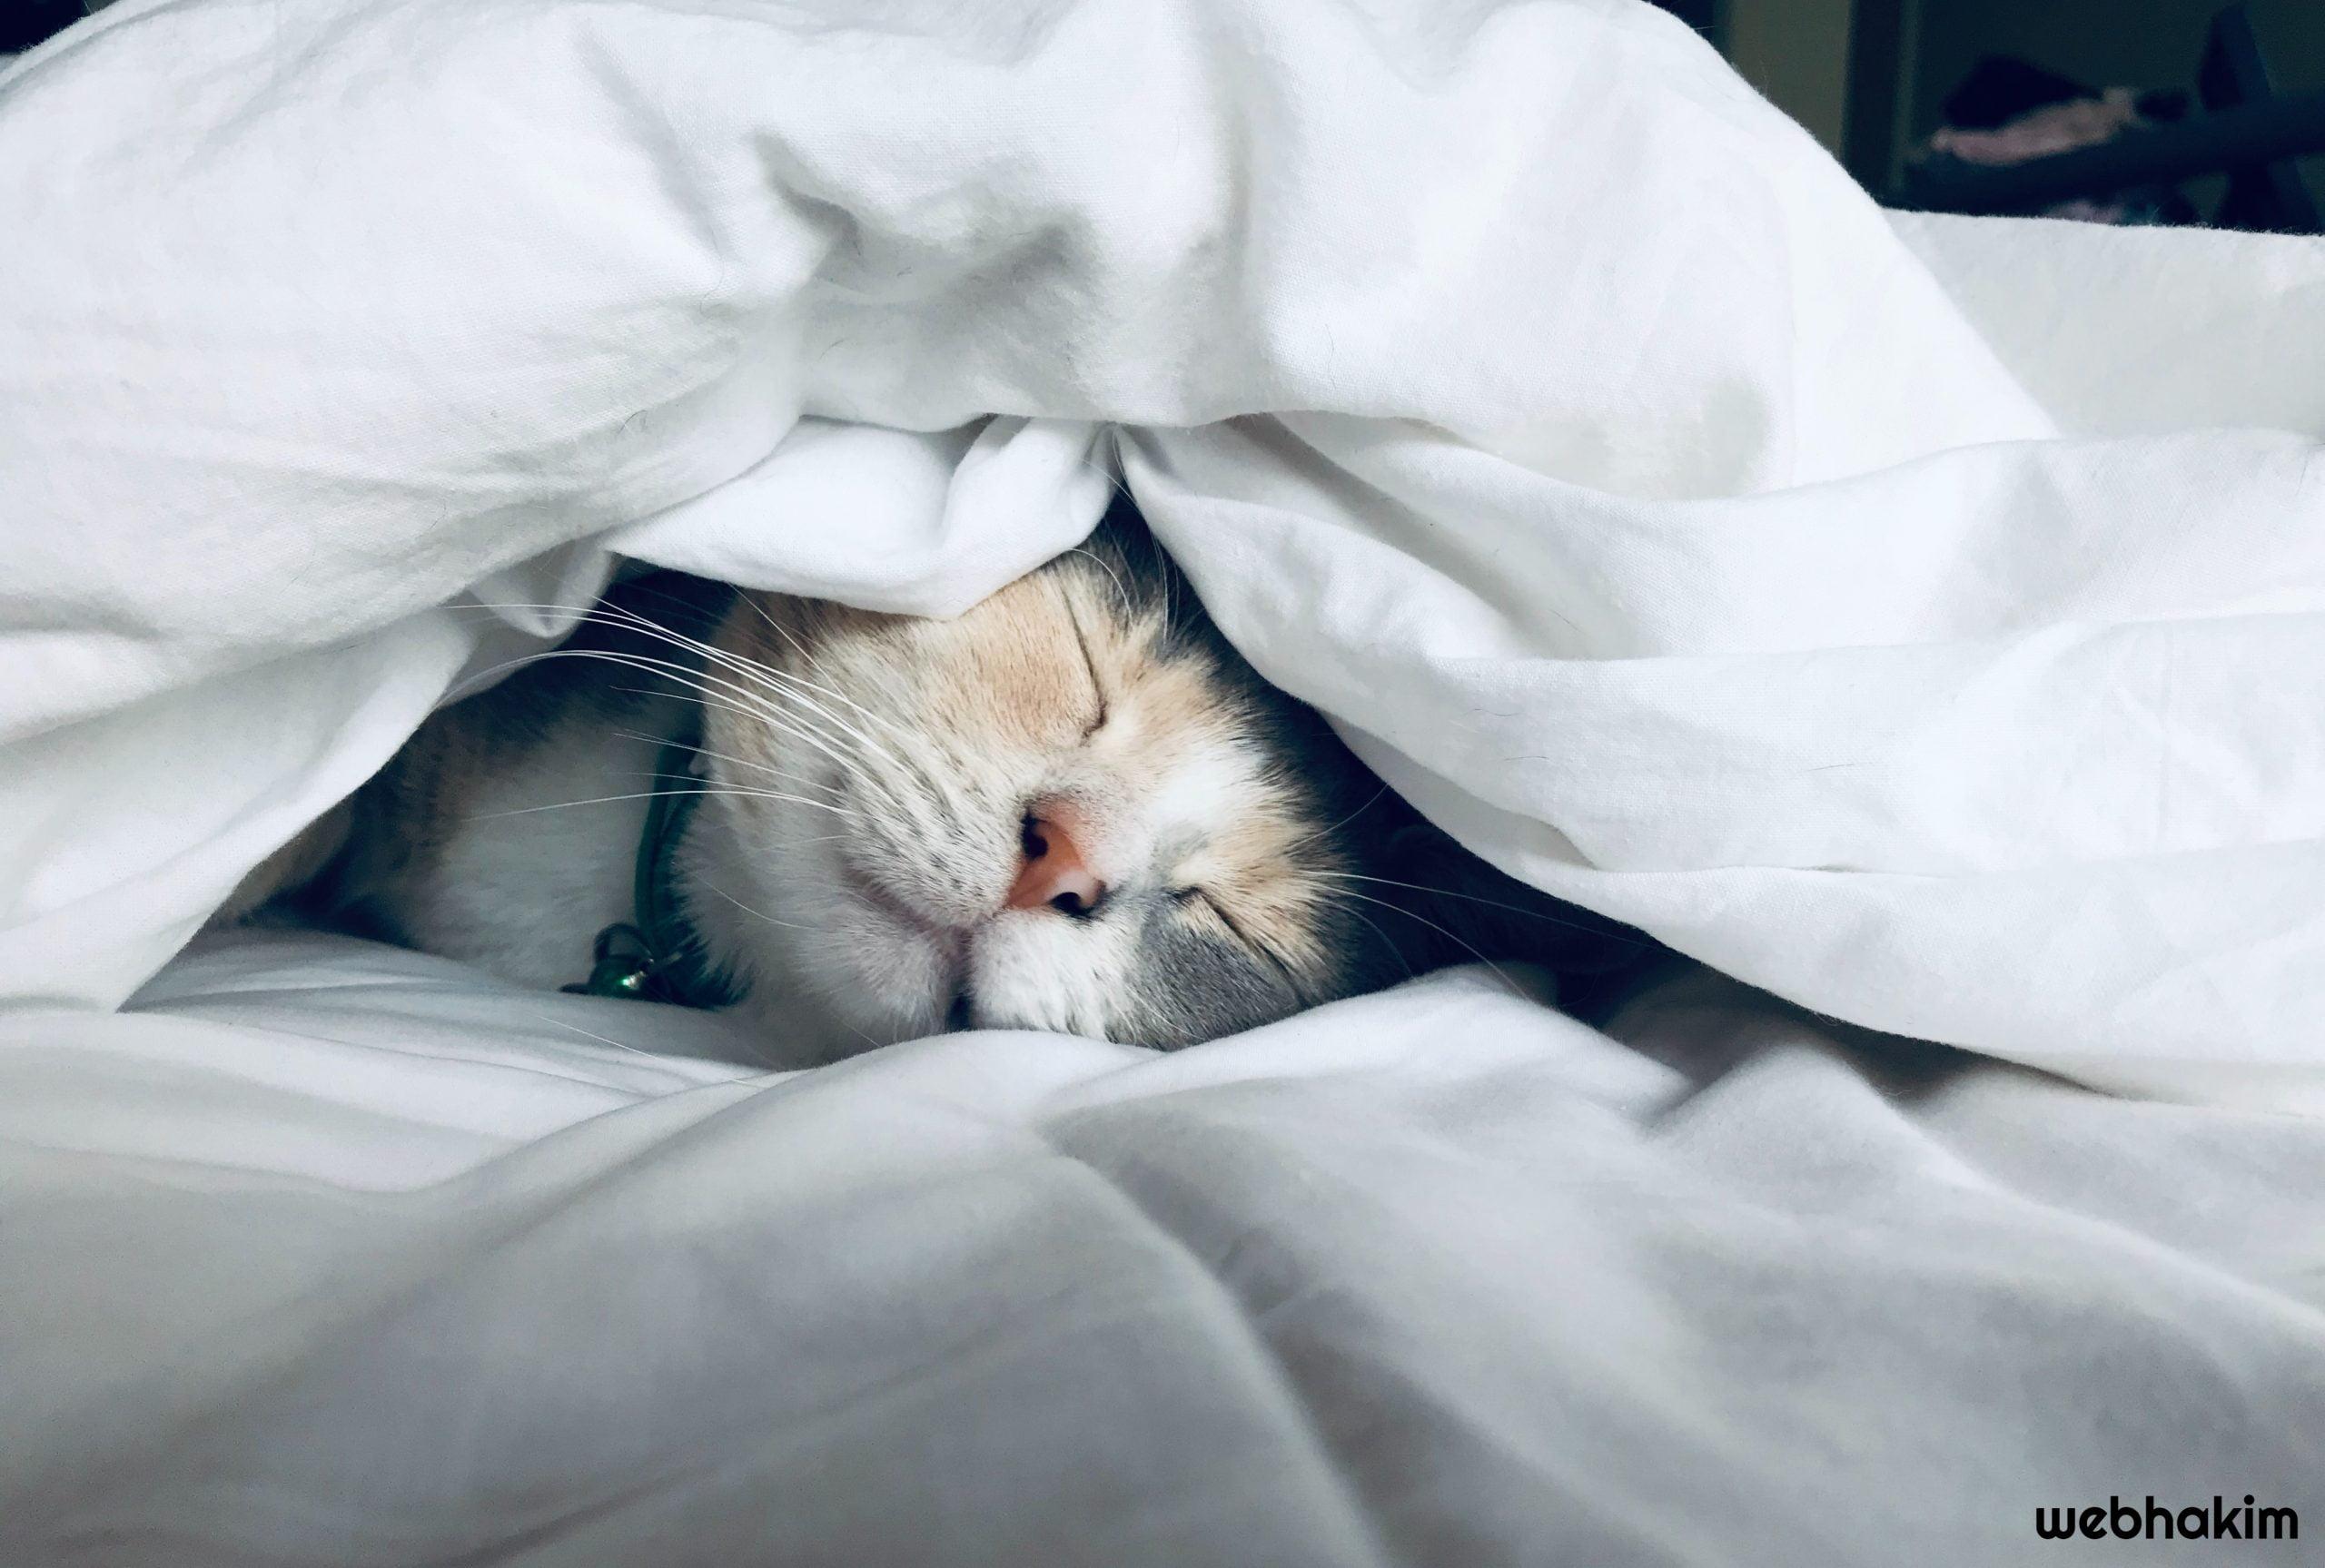 kedi davranislari webhakim